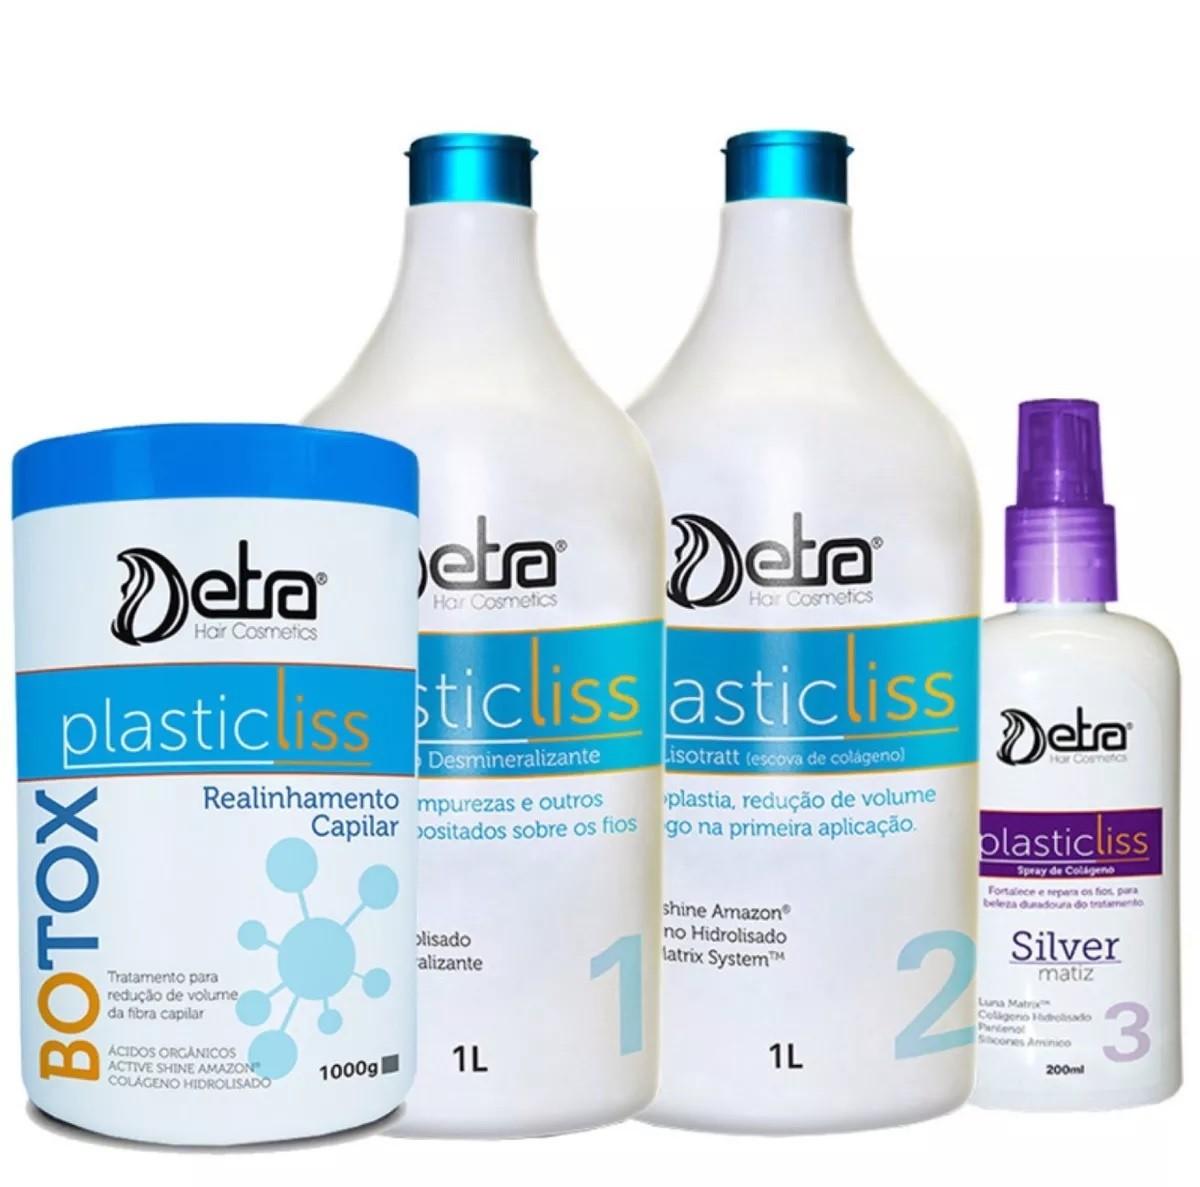 Detra Escova Progressiva Plastic Liss 1litro Sem Formol + Btox Detra Plastic Liss 1Kg - R